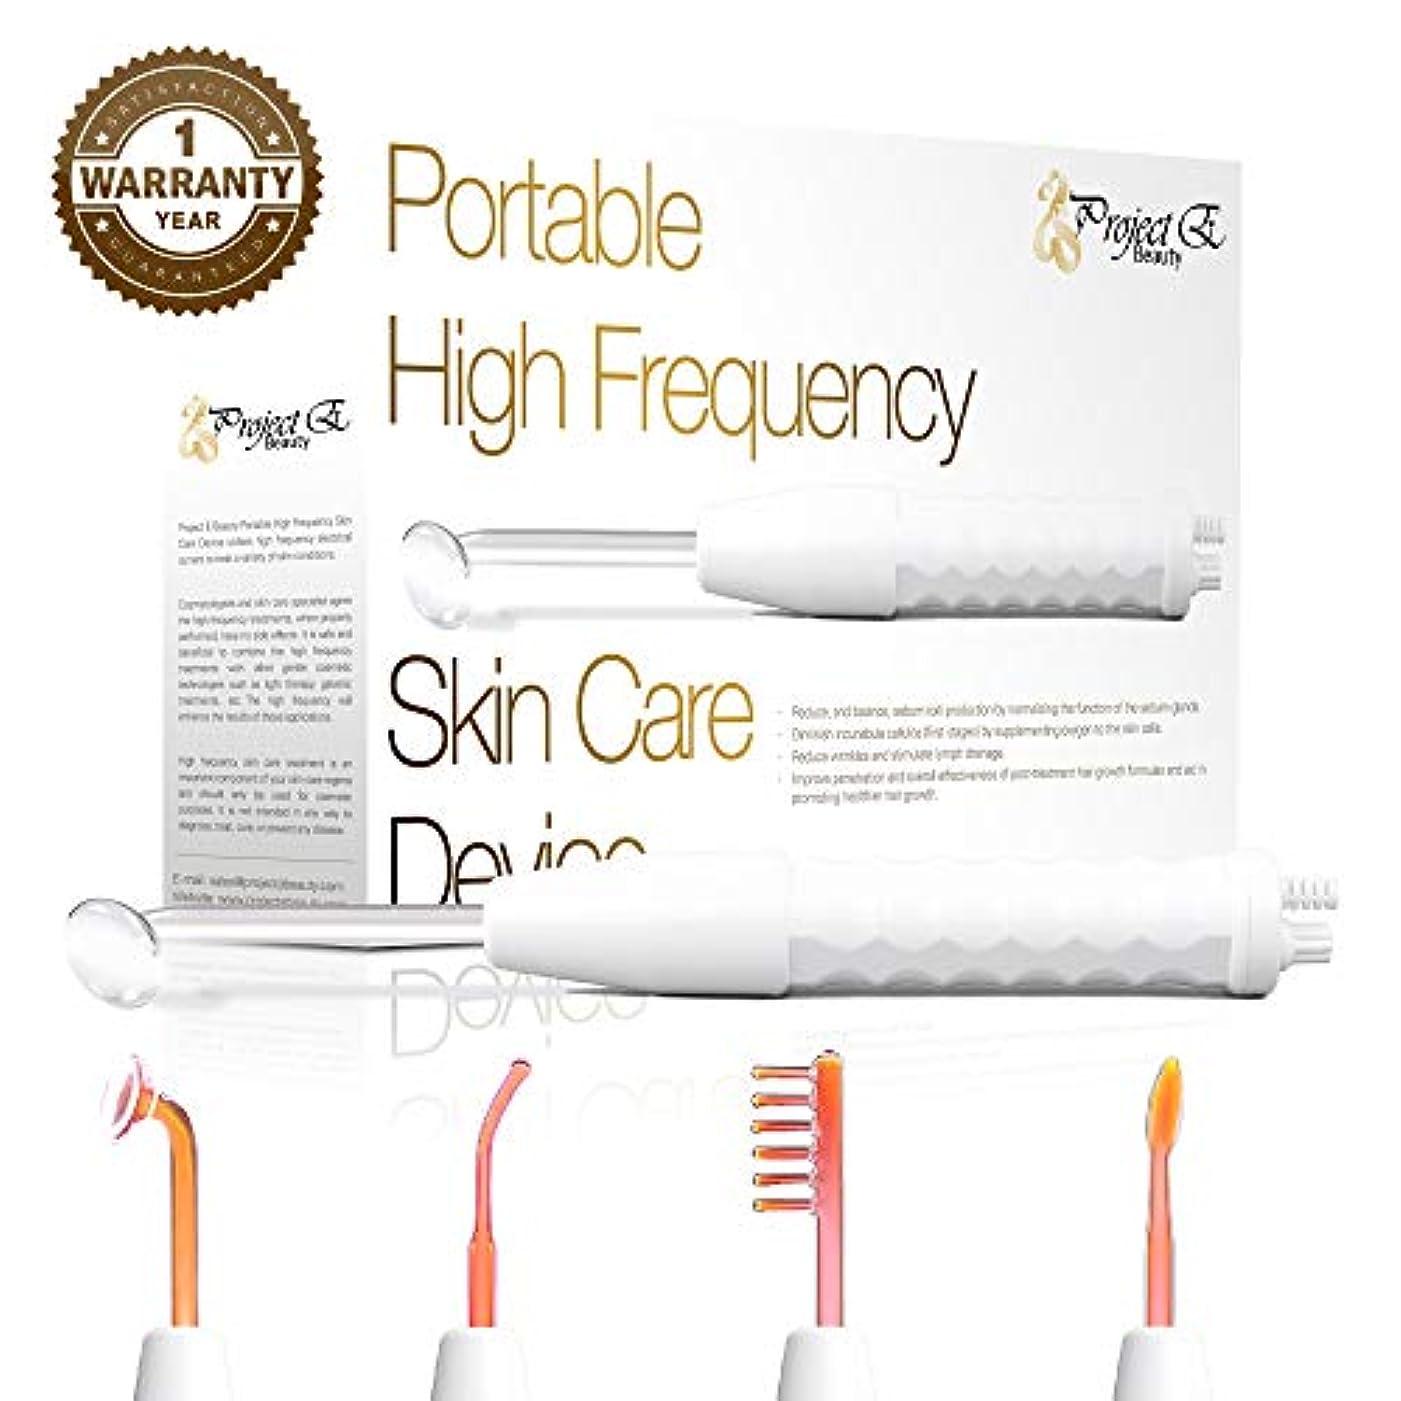 Project E Beauty D'arsonvalアルゴンおよびネオンガスポータブル高周波ワンド直接家庭用 - 肌の引き締め、しわ、細い線、ふくらんでいる目の皮膚療法(ネオンガス(オレンジレッド))